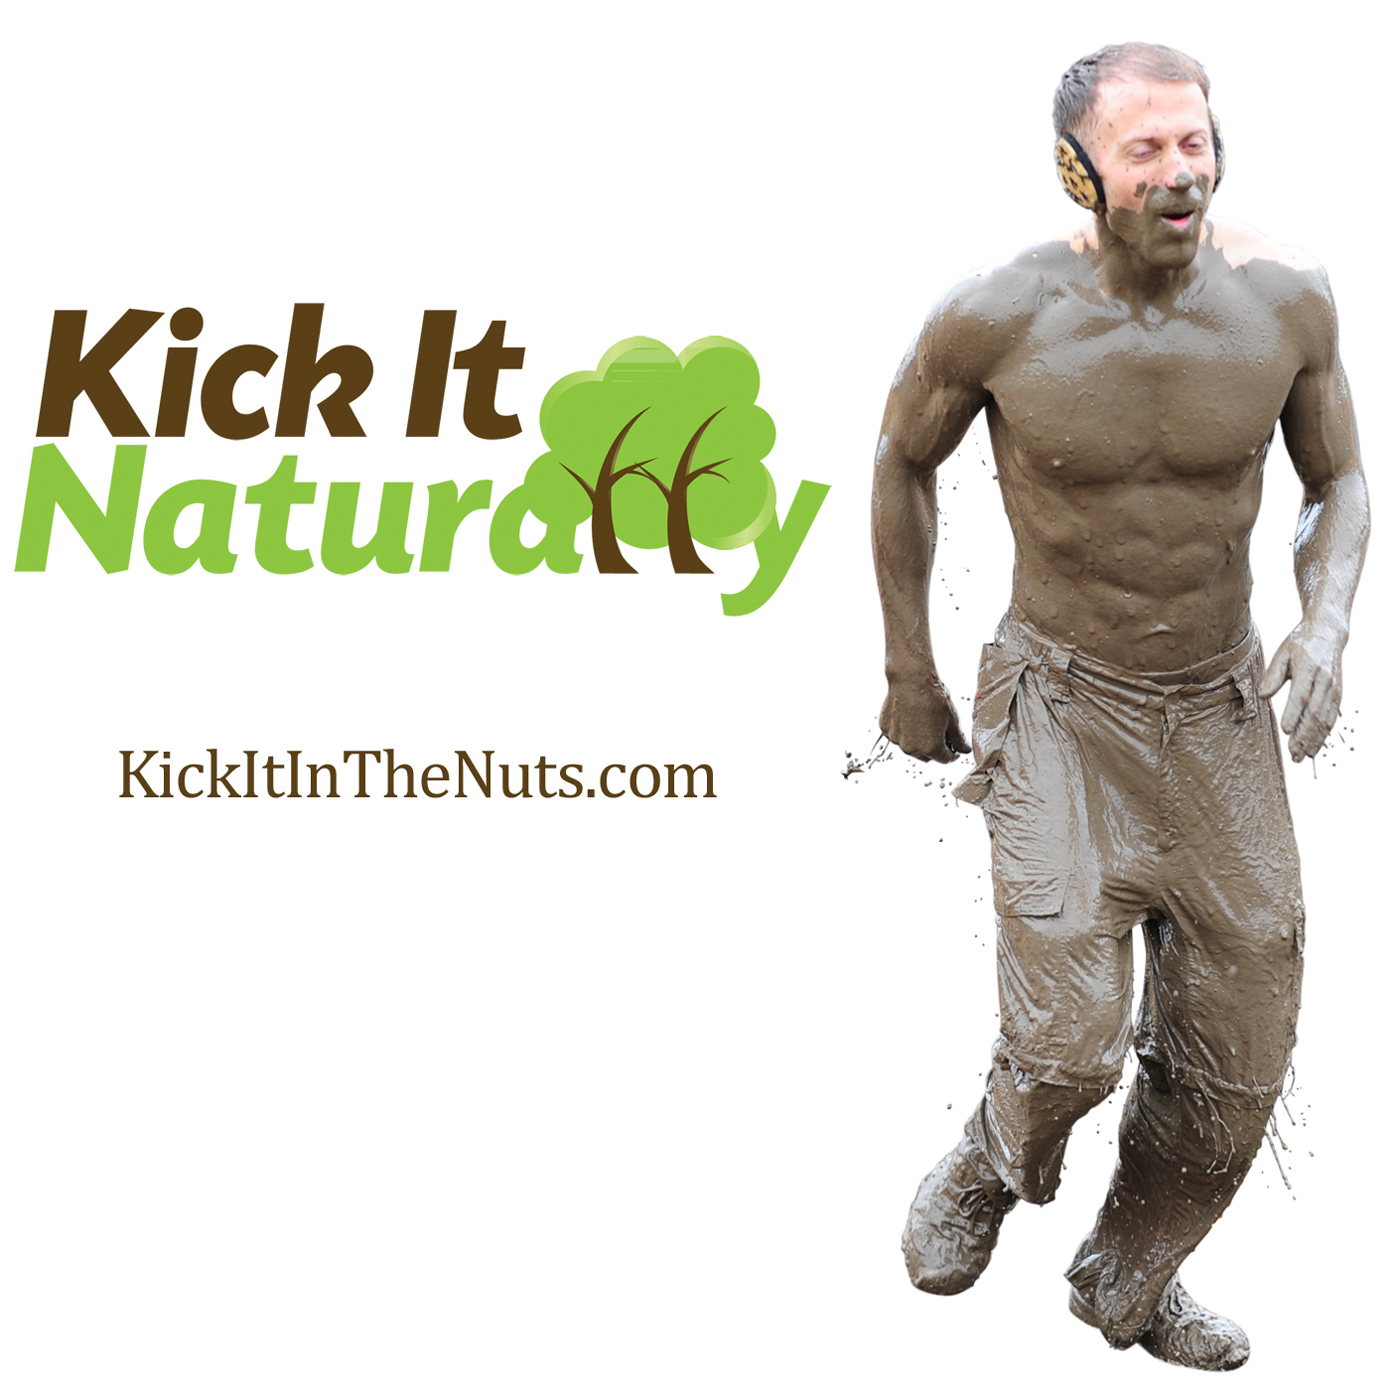 Kick it naturally podcast